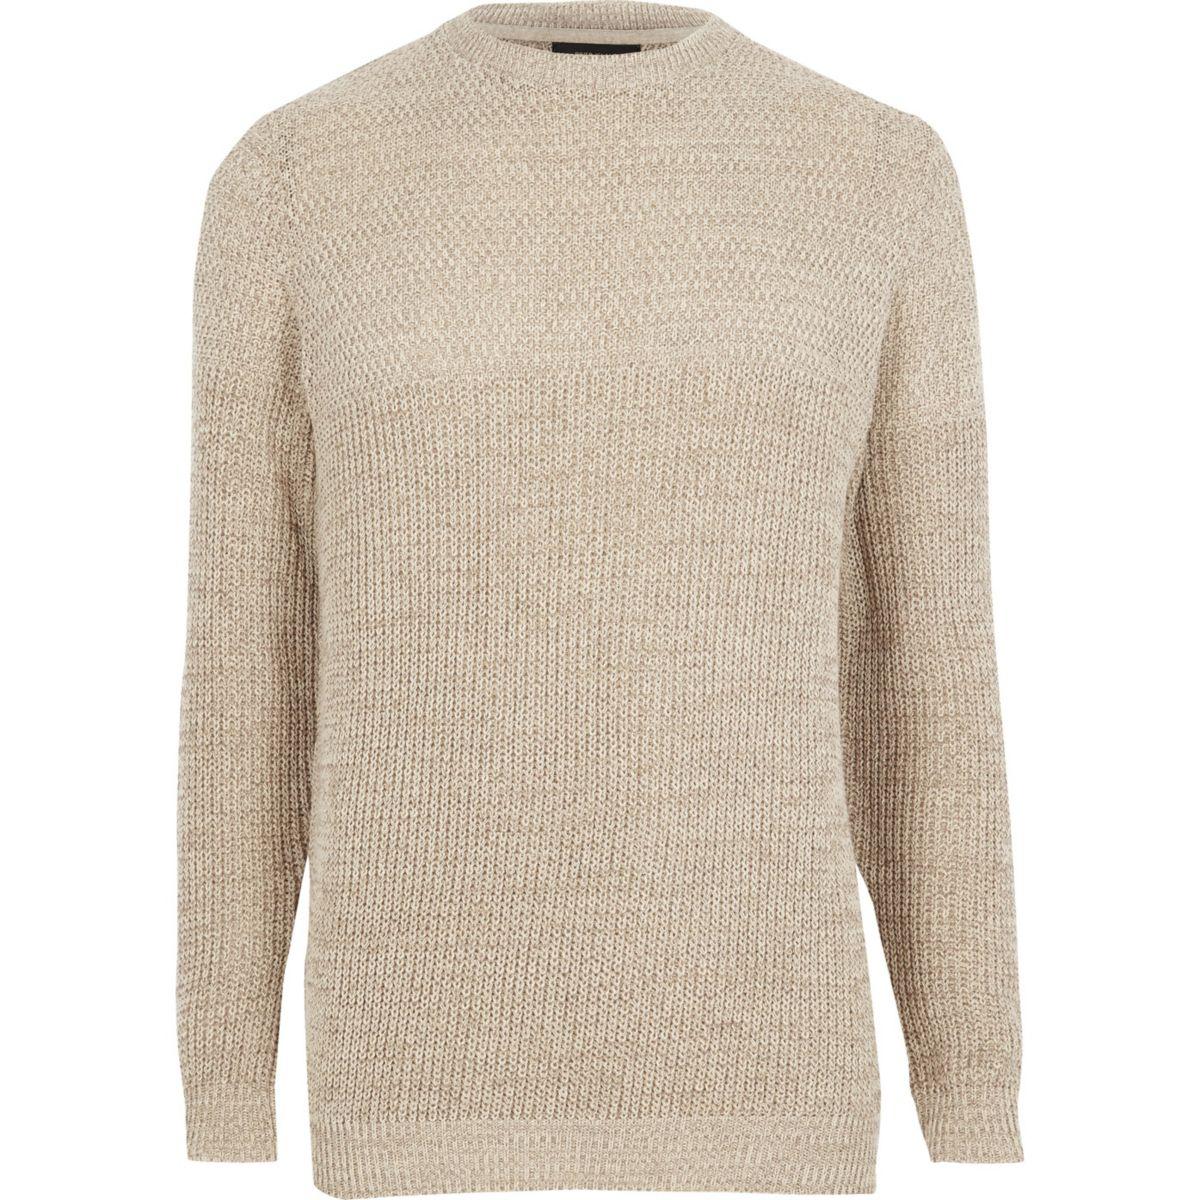 Cream textured knit slim fit sweater